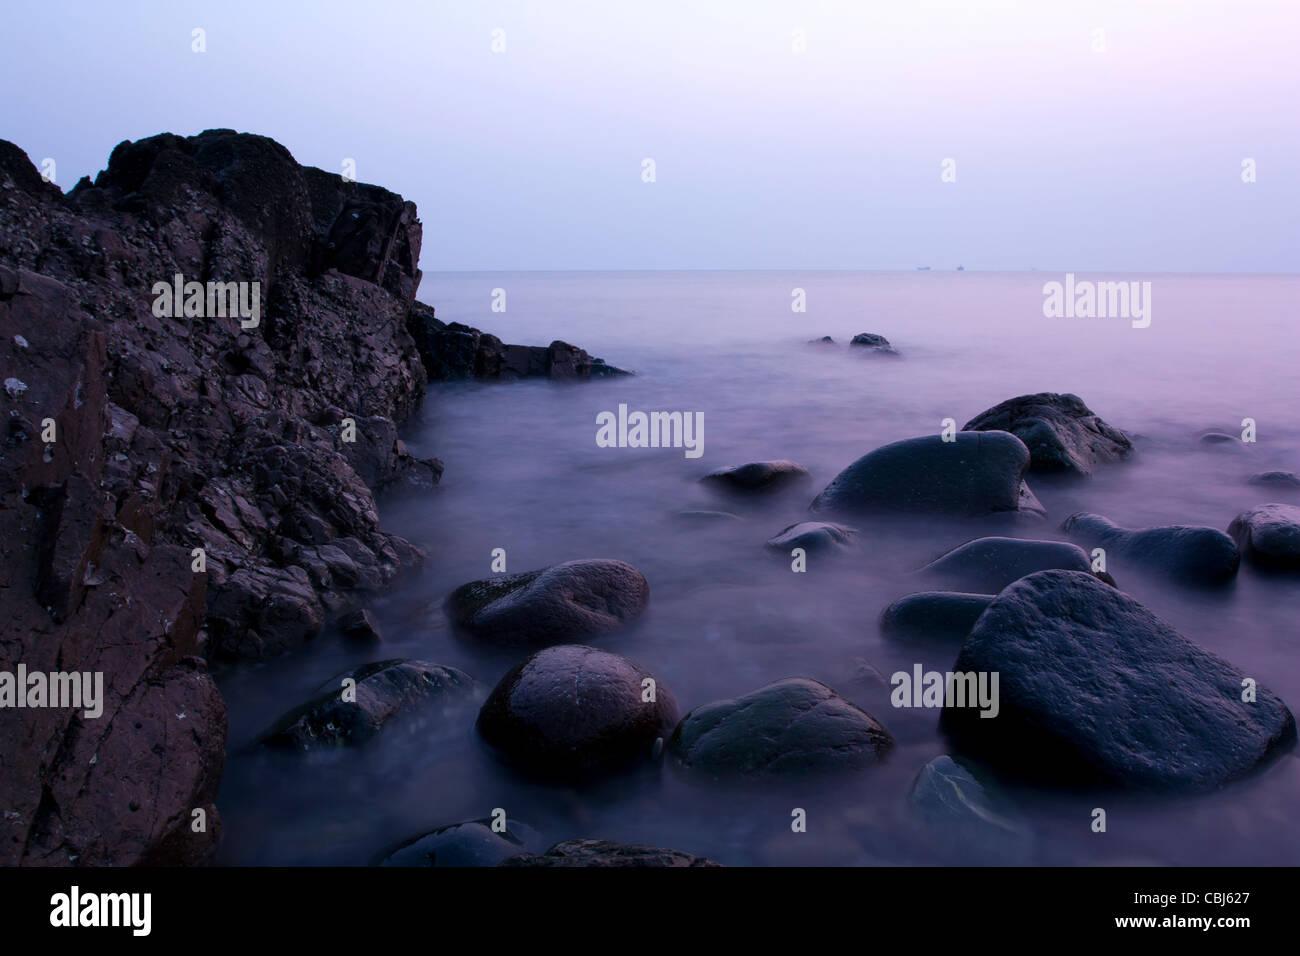 Stone sea fog,Sea, mist,beach,sunrise,Stone island, the South China  Sea, Qingdao,ZhuChadao,Shaped stone,Slow  gate,B,Cobbleston - Stock Image